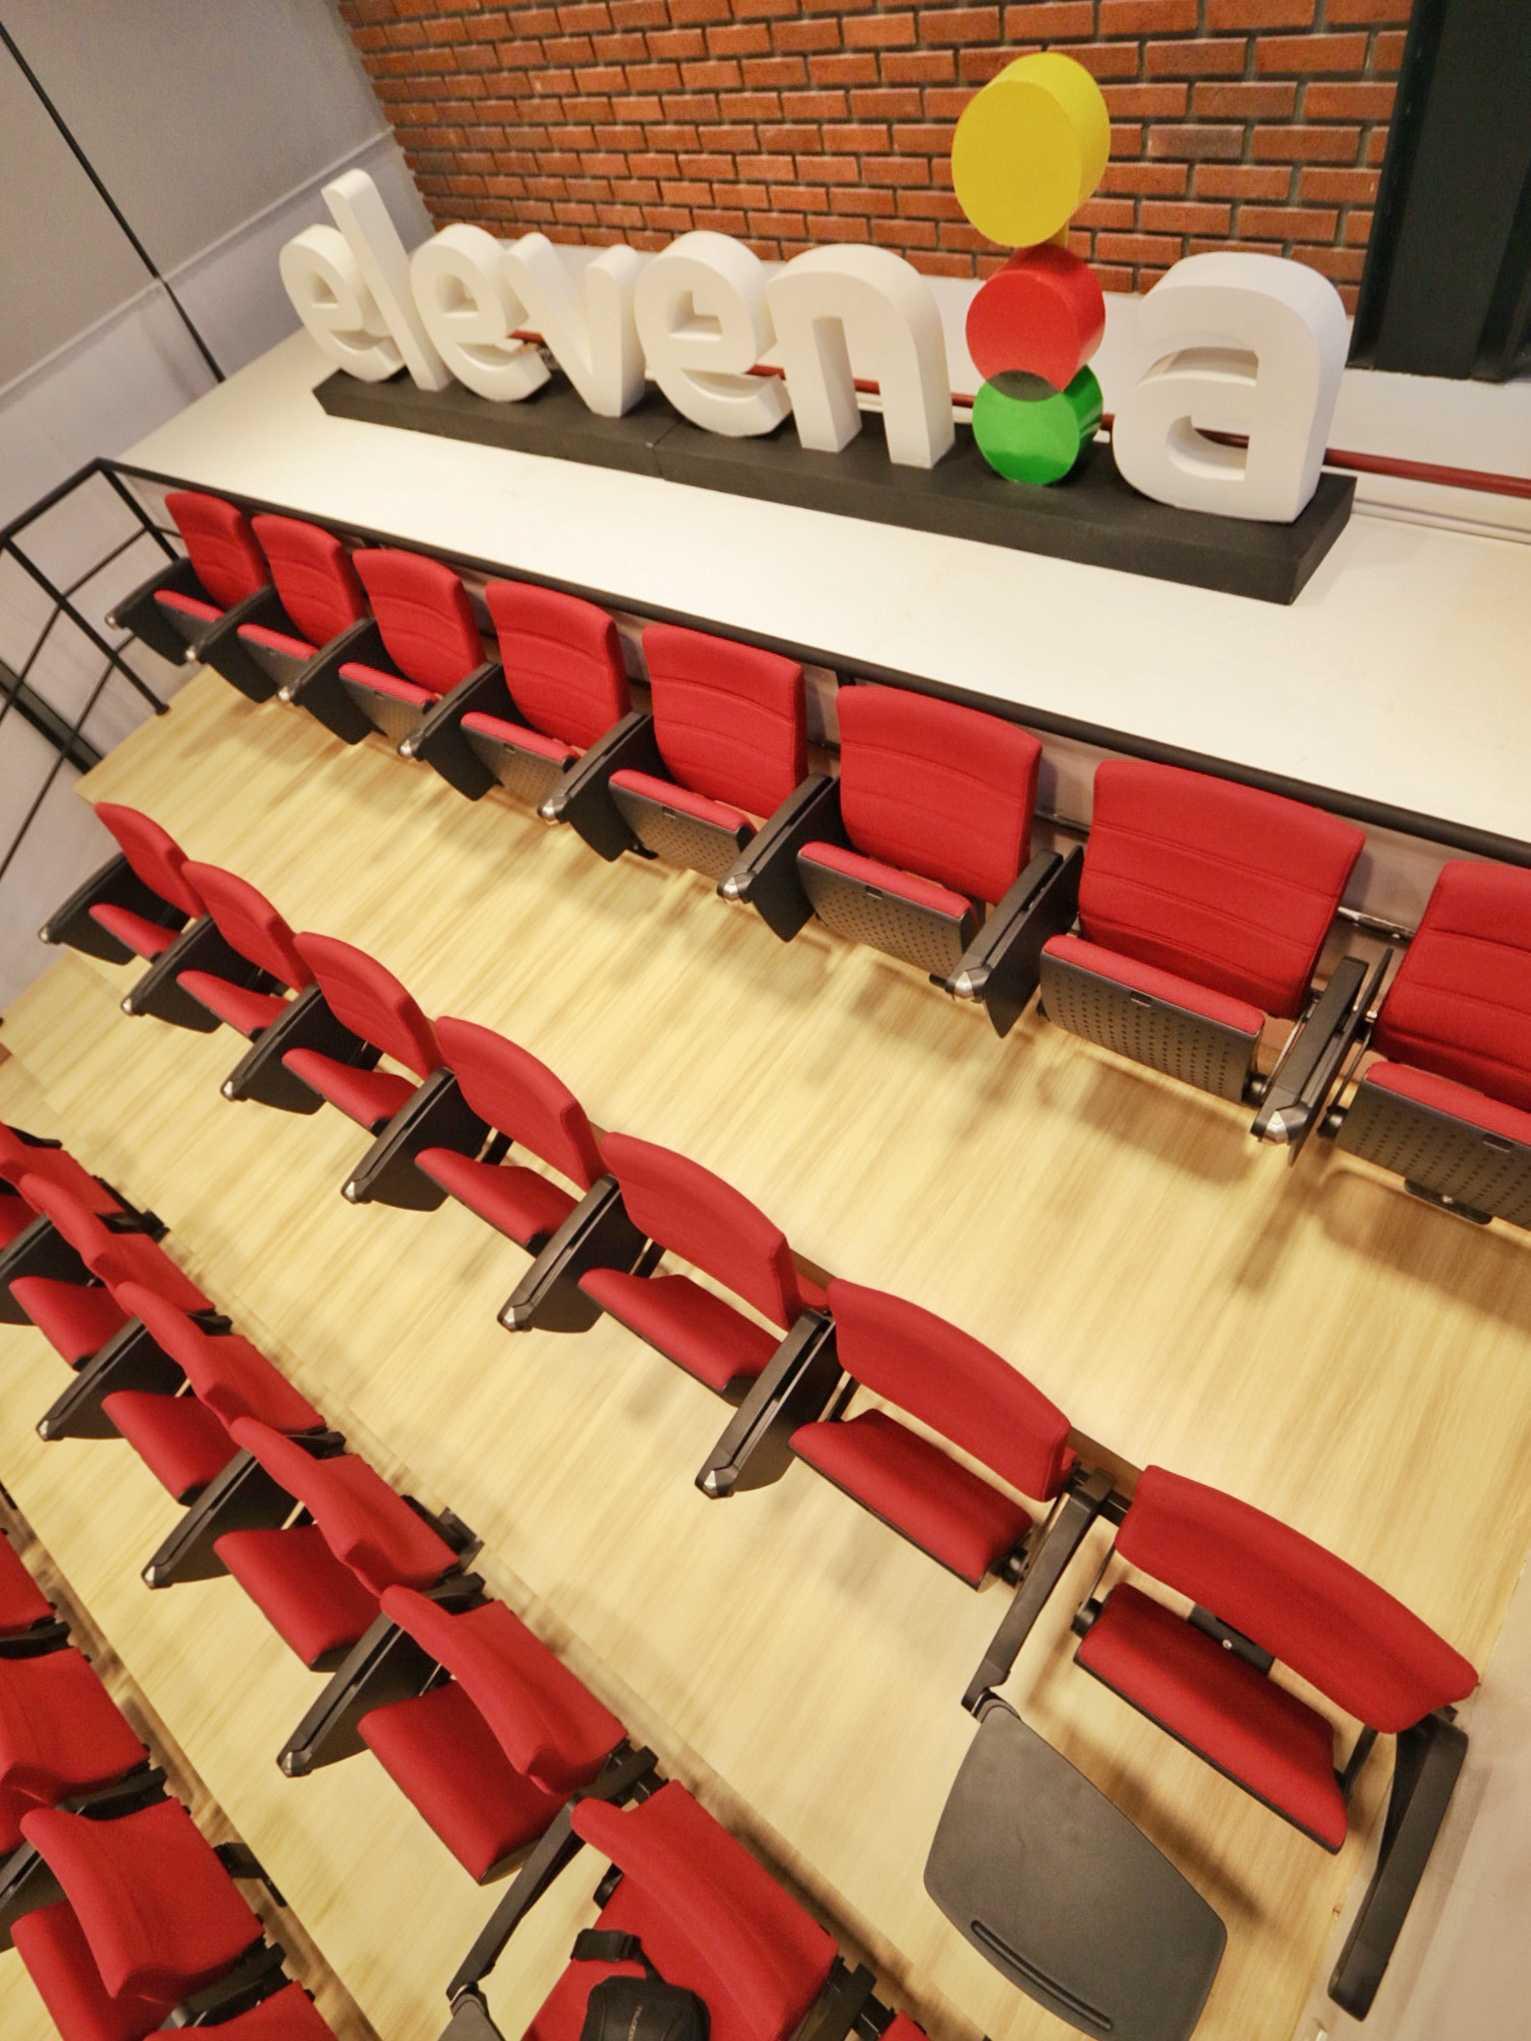 Kotak Design Elevenia Office Daerah Khusus Ibukota Jakarta, Indonesia Daerah Khusus Ibukota Jakarta, Indonesia Kotak-Design-Elevenia-Office  56777